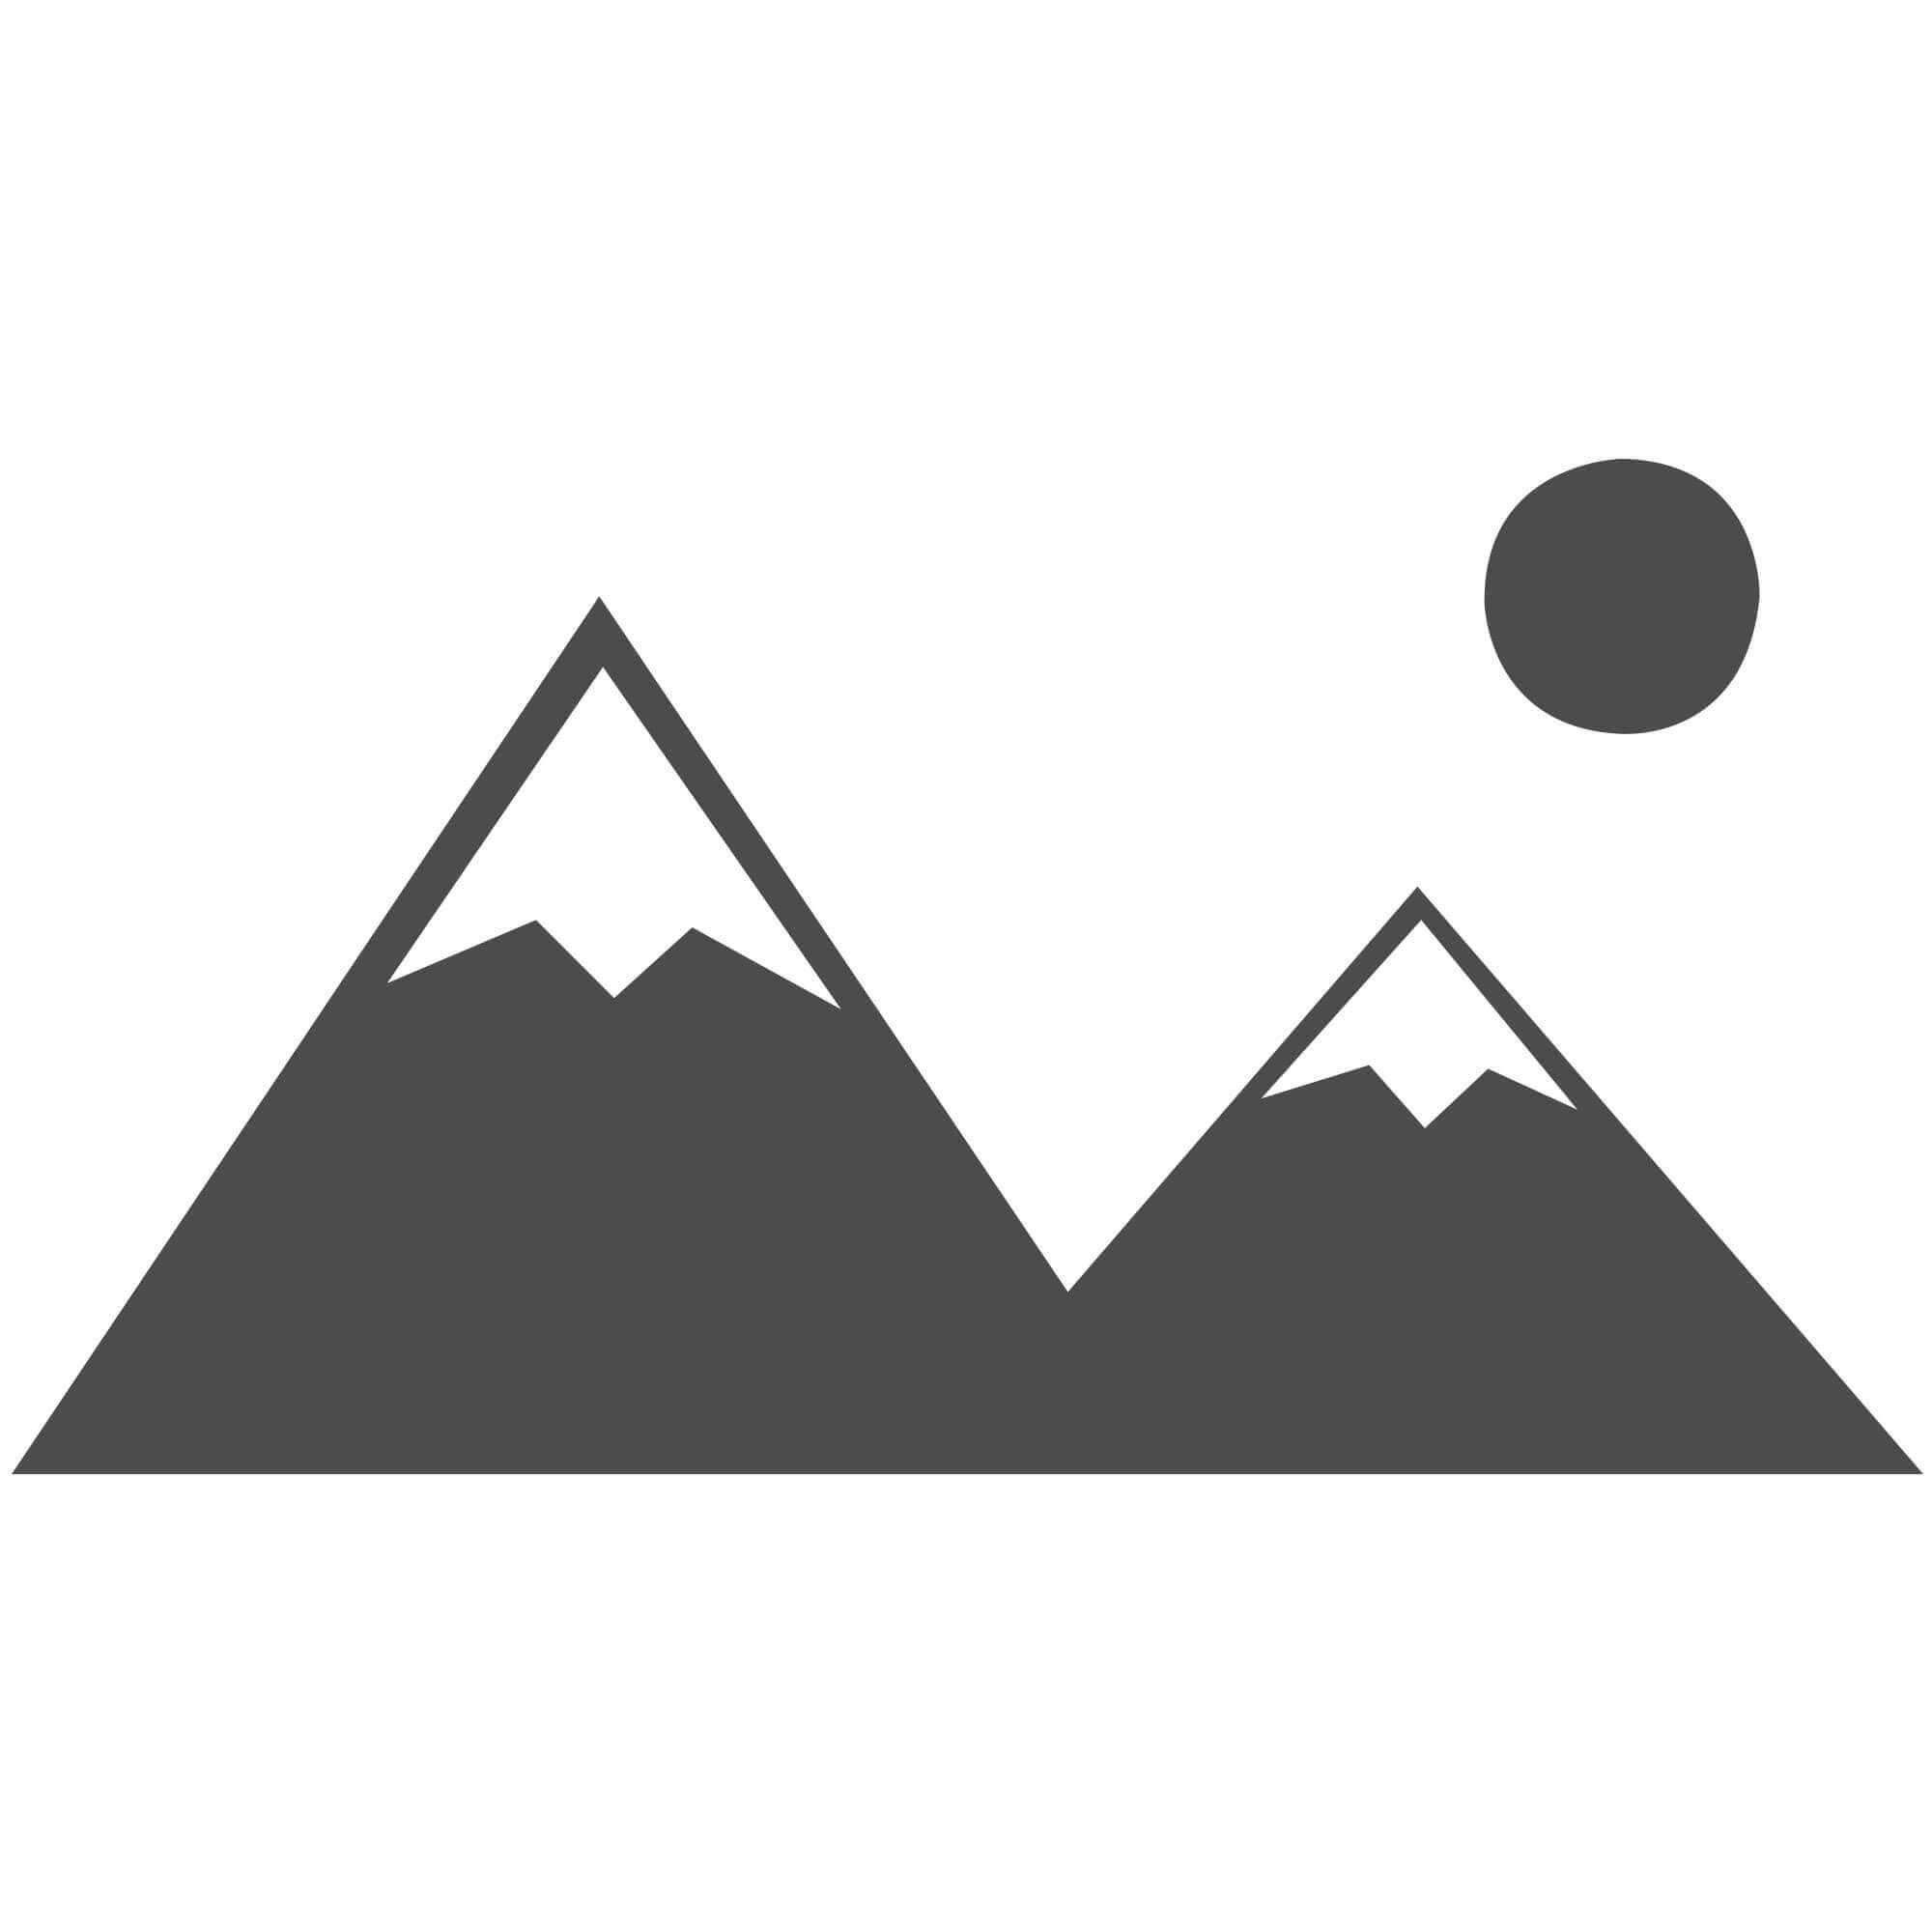 "Persian Keshan Dozar Rug - 138 x 215 cm (4'6"" x 7')"